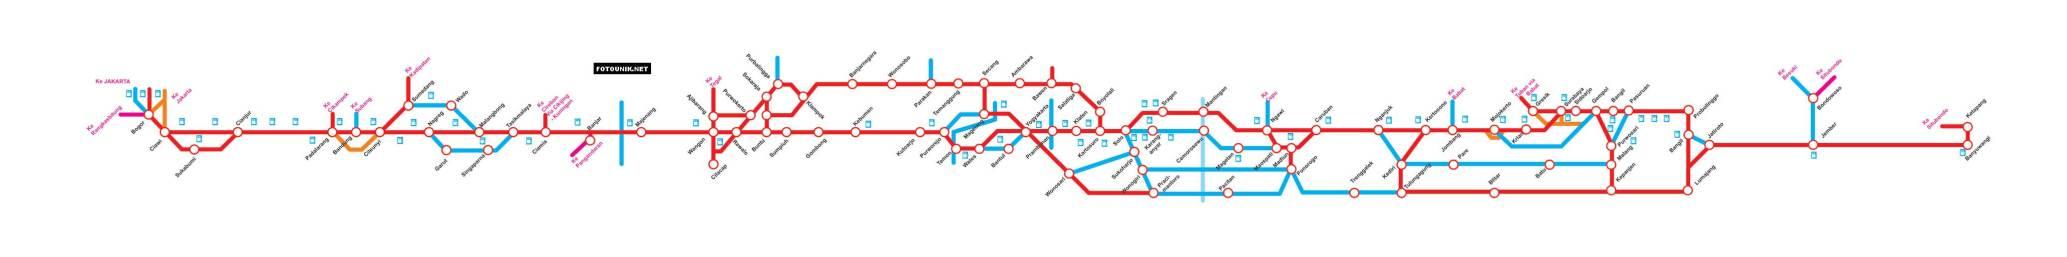 Peta Mudik 2013 Jalur Selatan